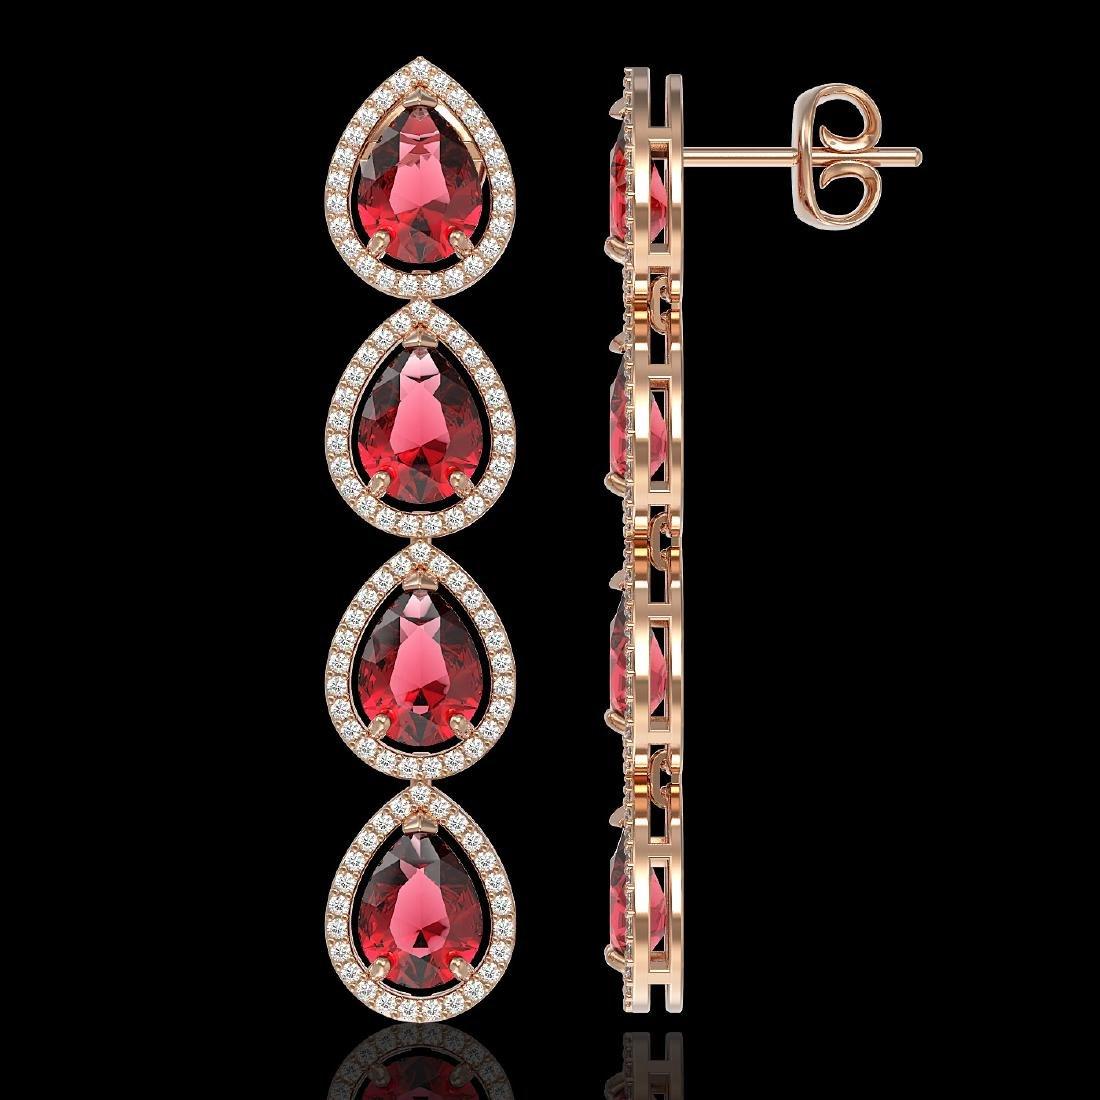 10.48 CTW Tourmaline & Diamond Halo Earrings 10K Rose - 2